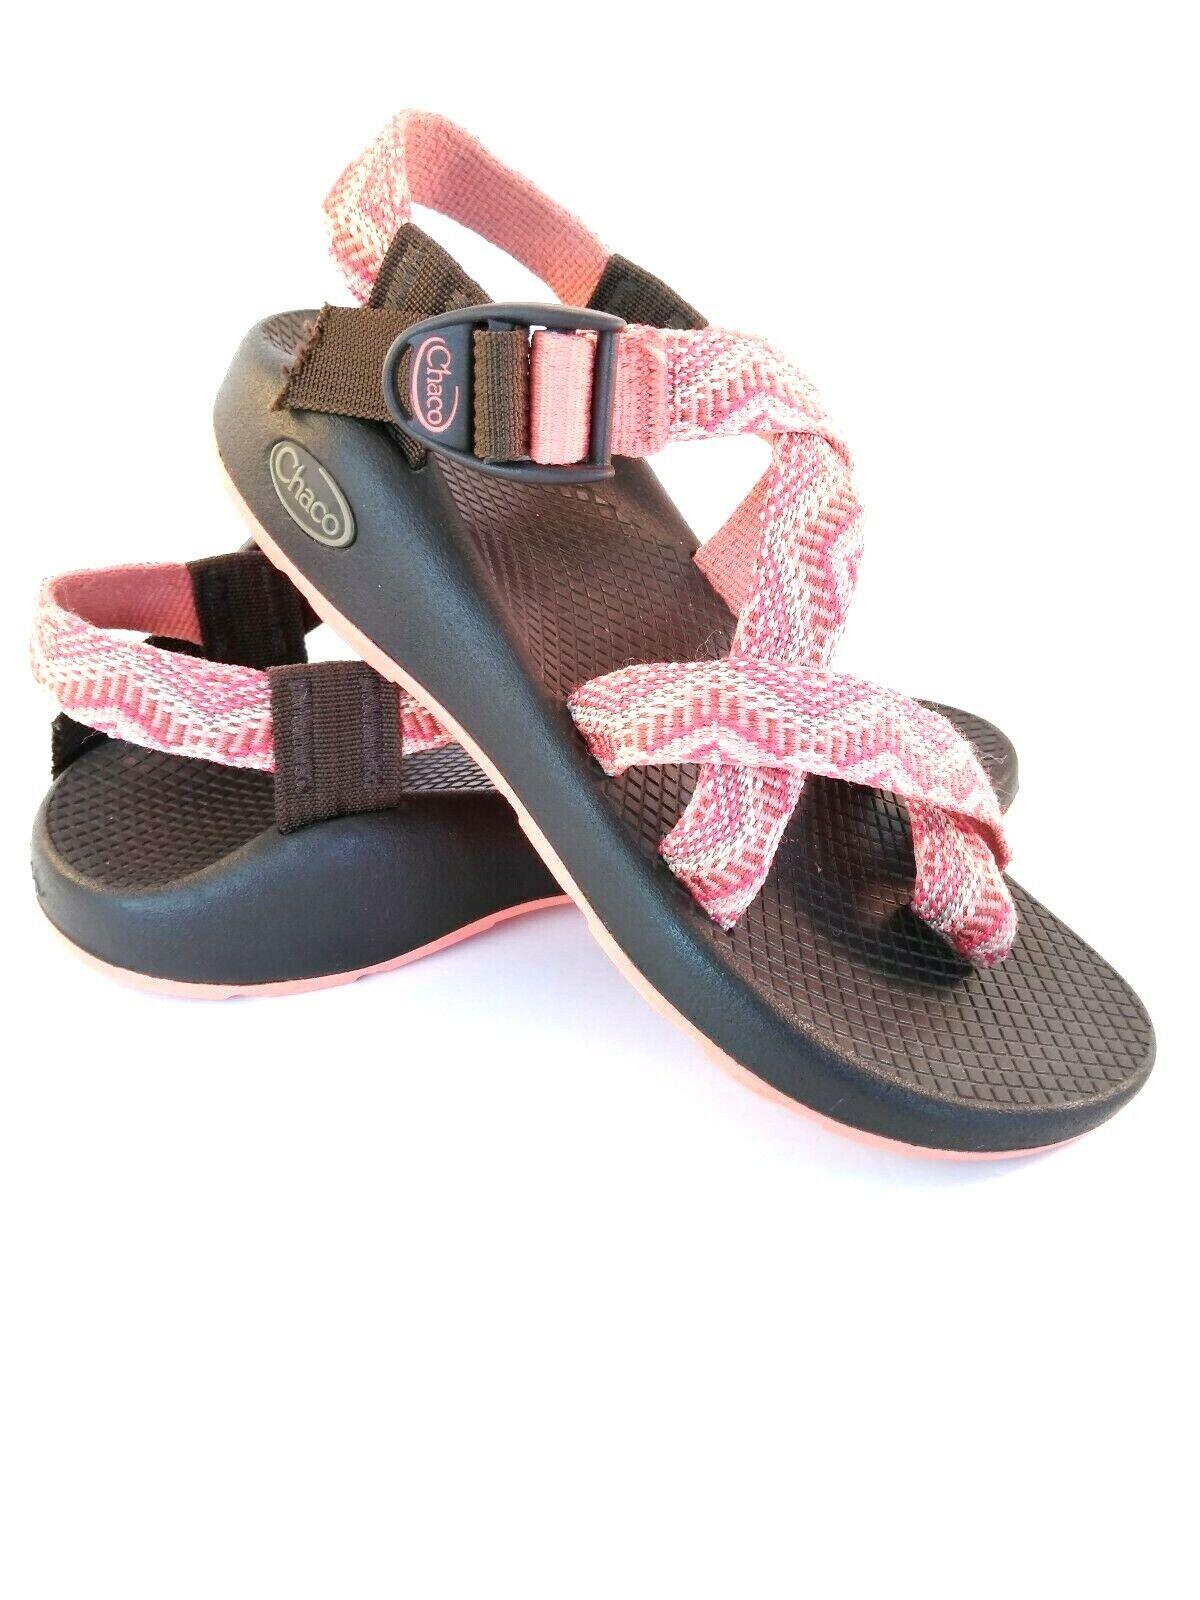 Chaco donna Sz 6 Peach Marronee Aztec Toe Loop Outdoor Hiking Water Sports Sandals